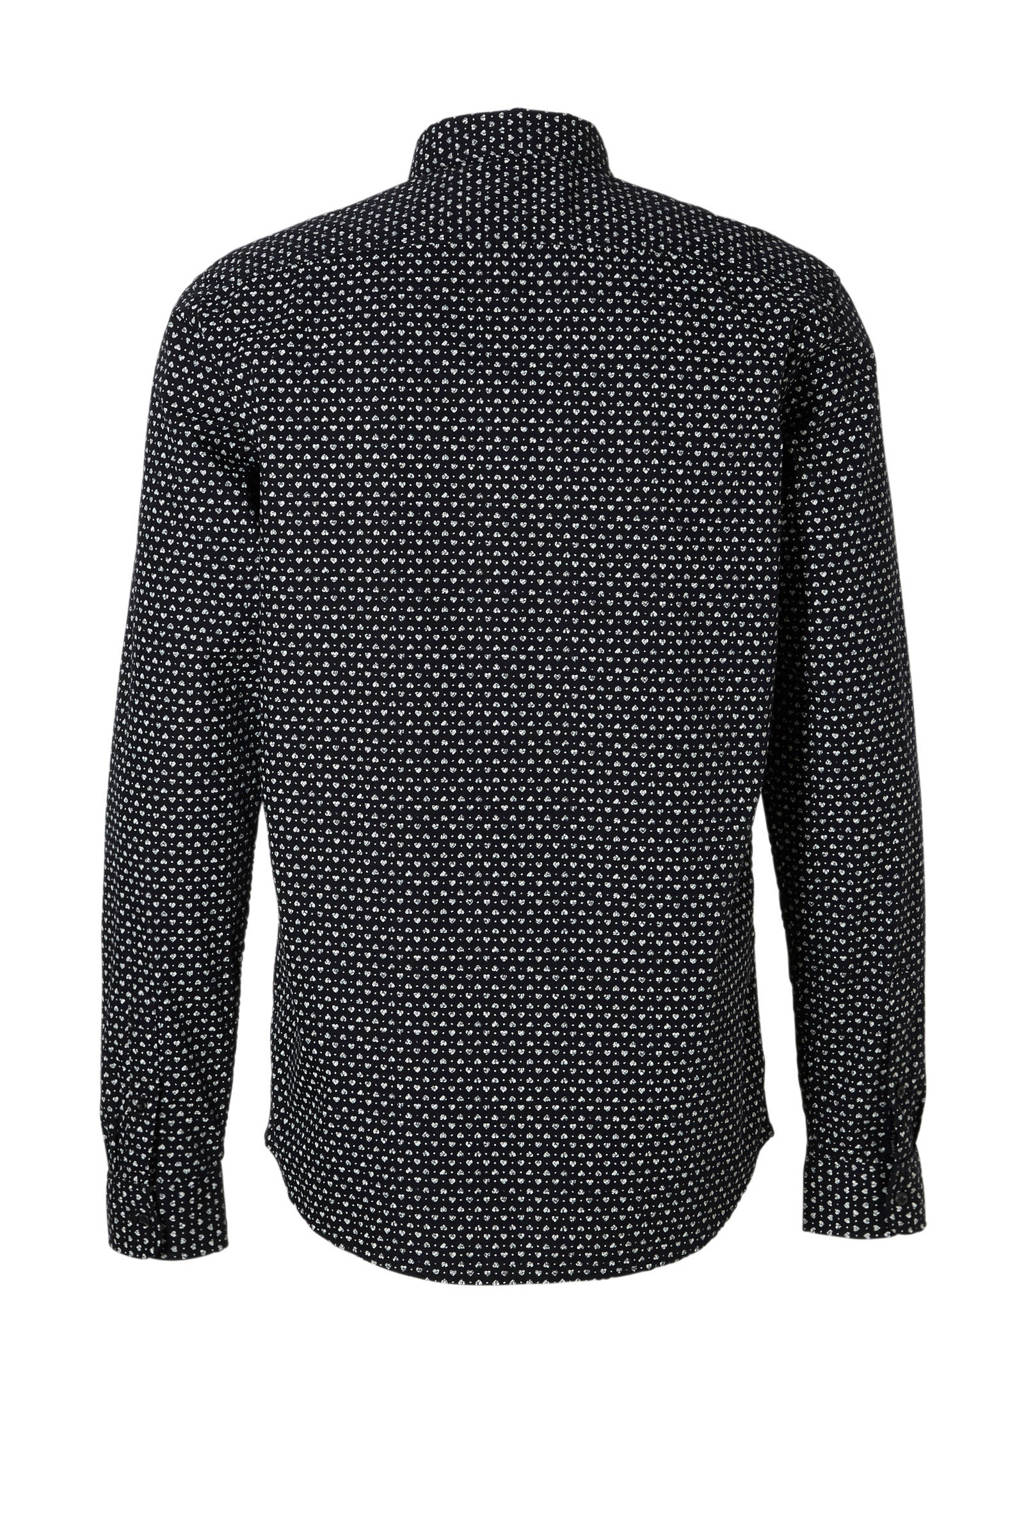 Overhemd Zwart Wit.Scotch Soda Regular Fit Overhemd Wehkamp